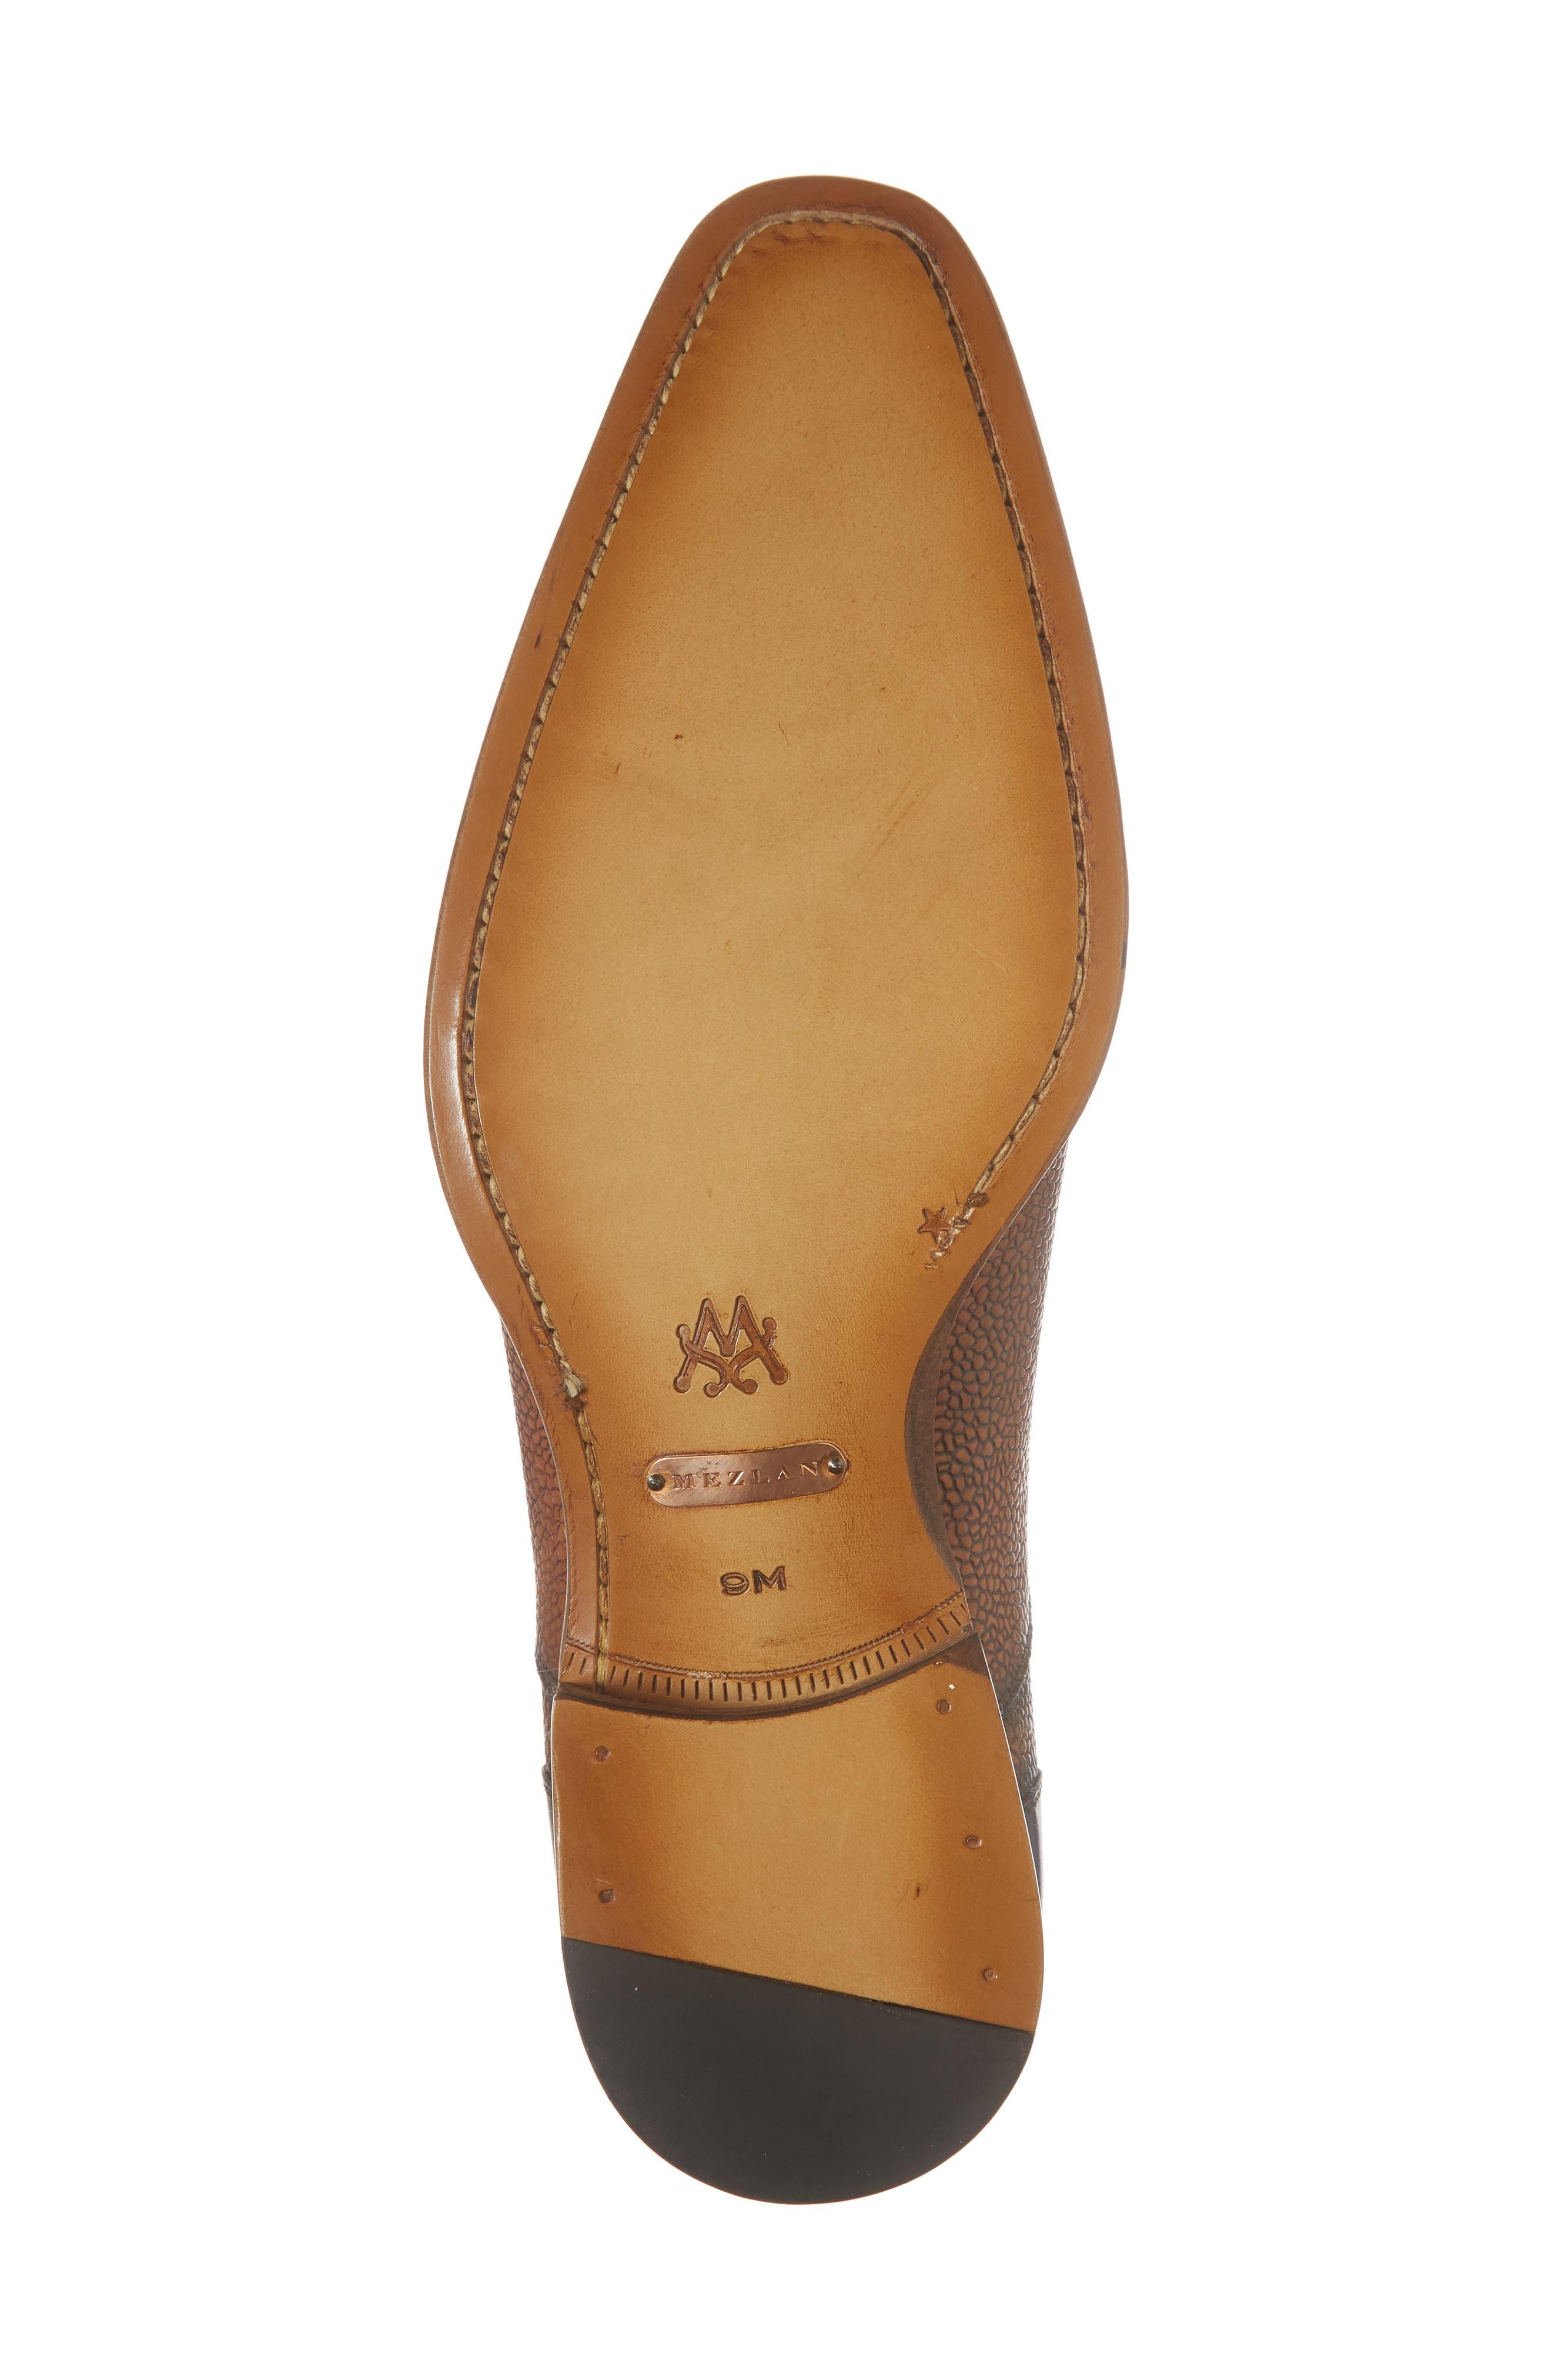 Verino Cap Toe Oxford,                             Alternate thumbnail 6, color,                             Blue/ Tan Leather